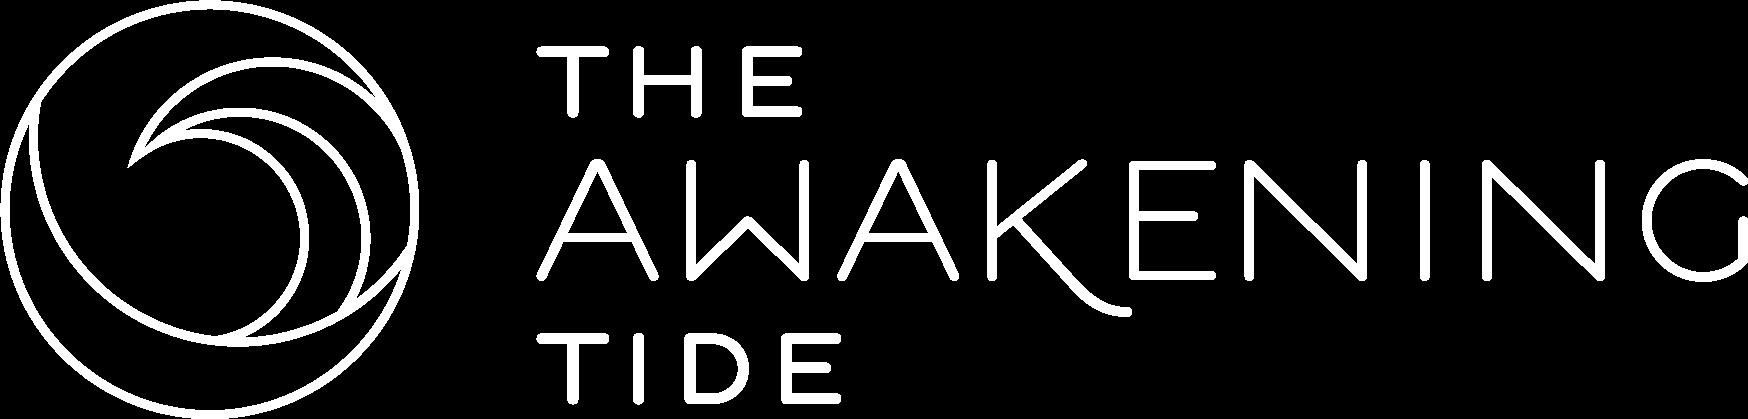 TheAwakeningTide